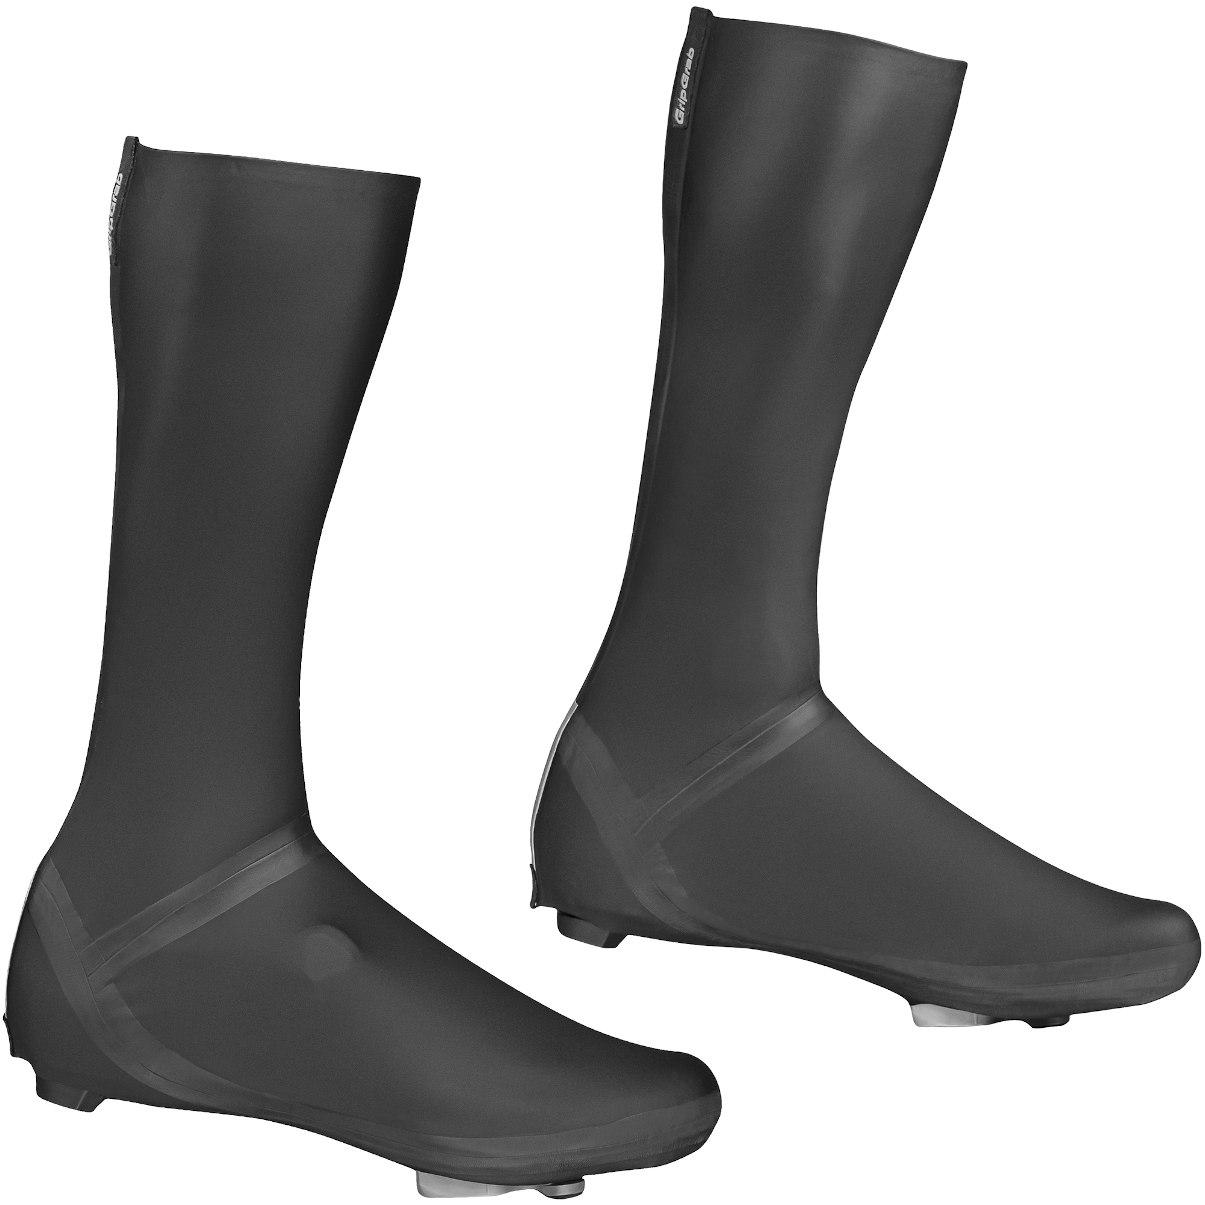 GripGrab Aqua Shield High Cut Road Shoe Covers - Black